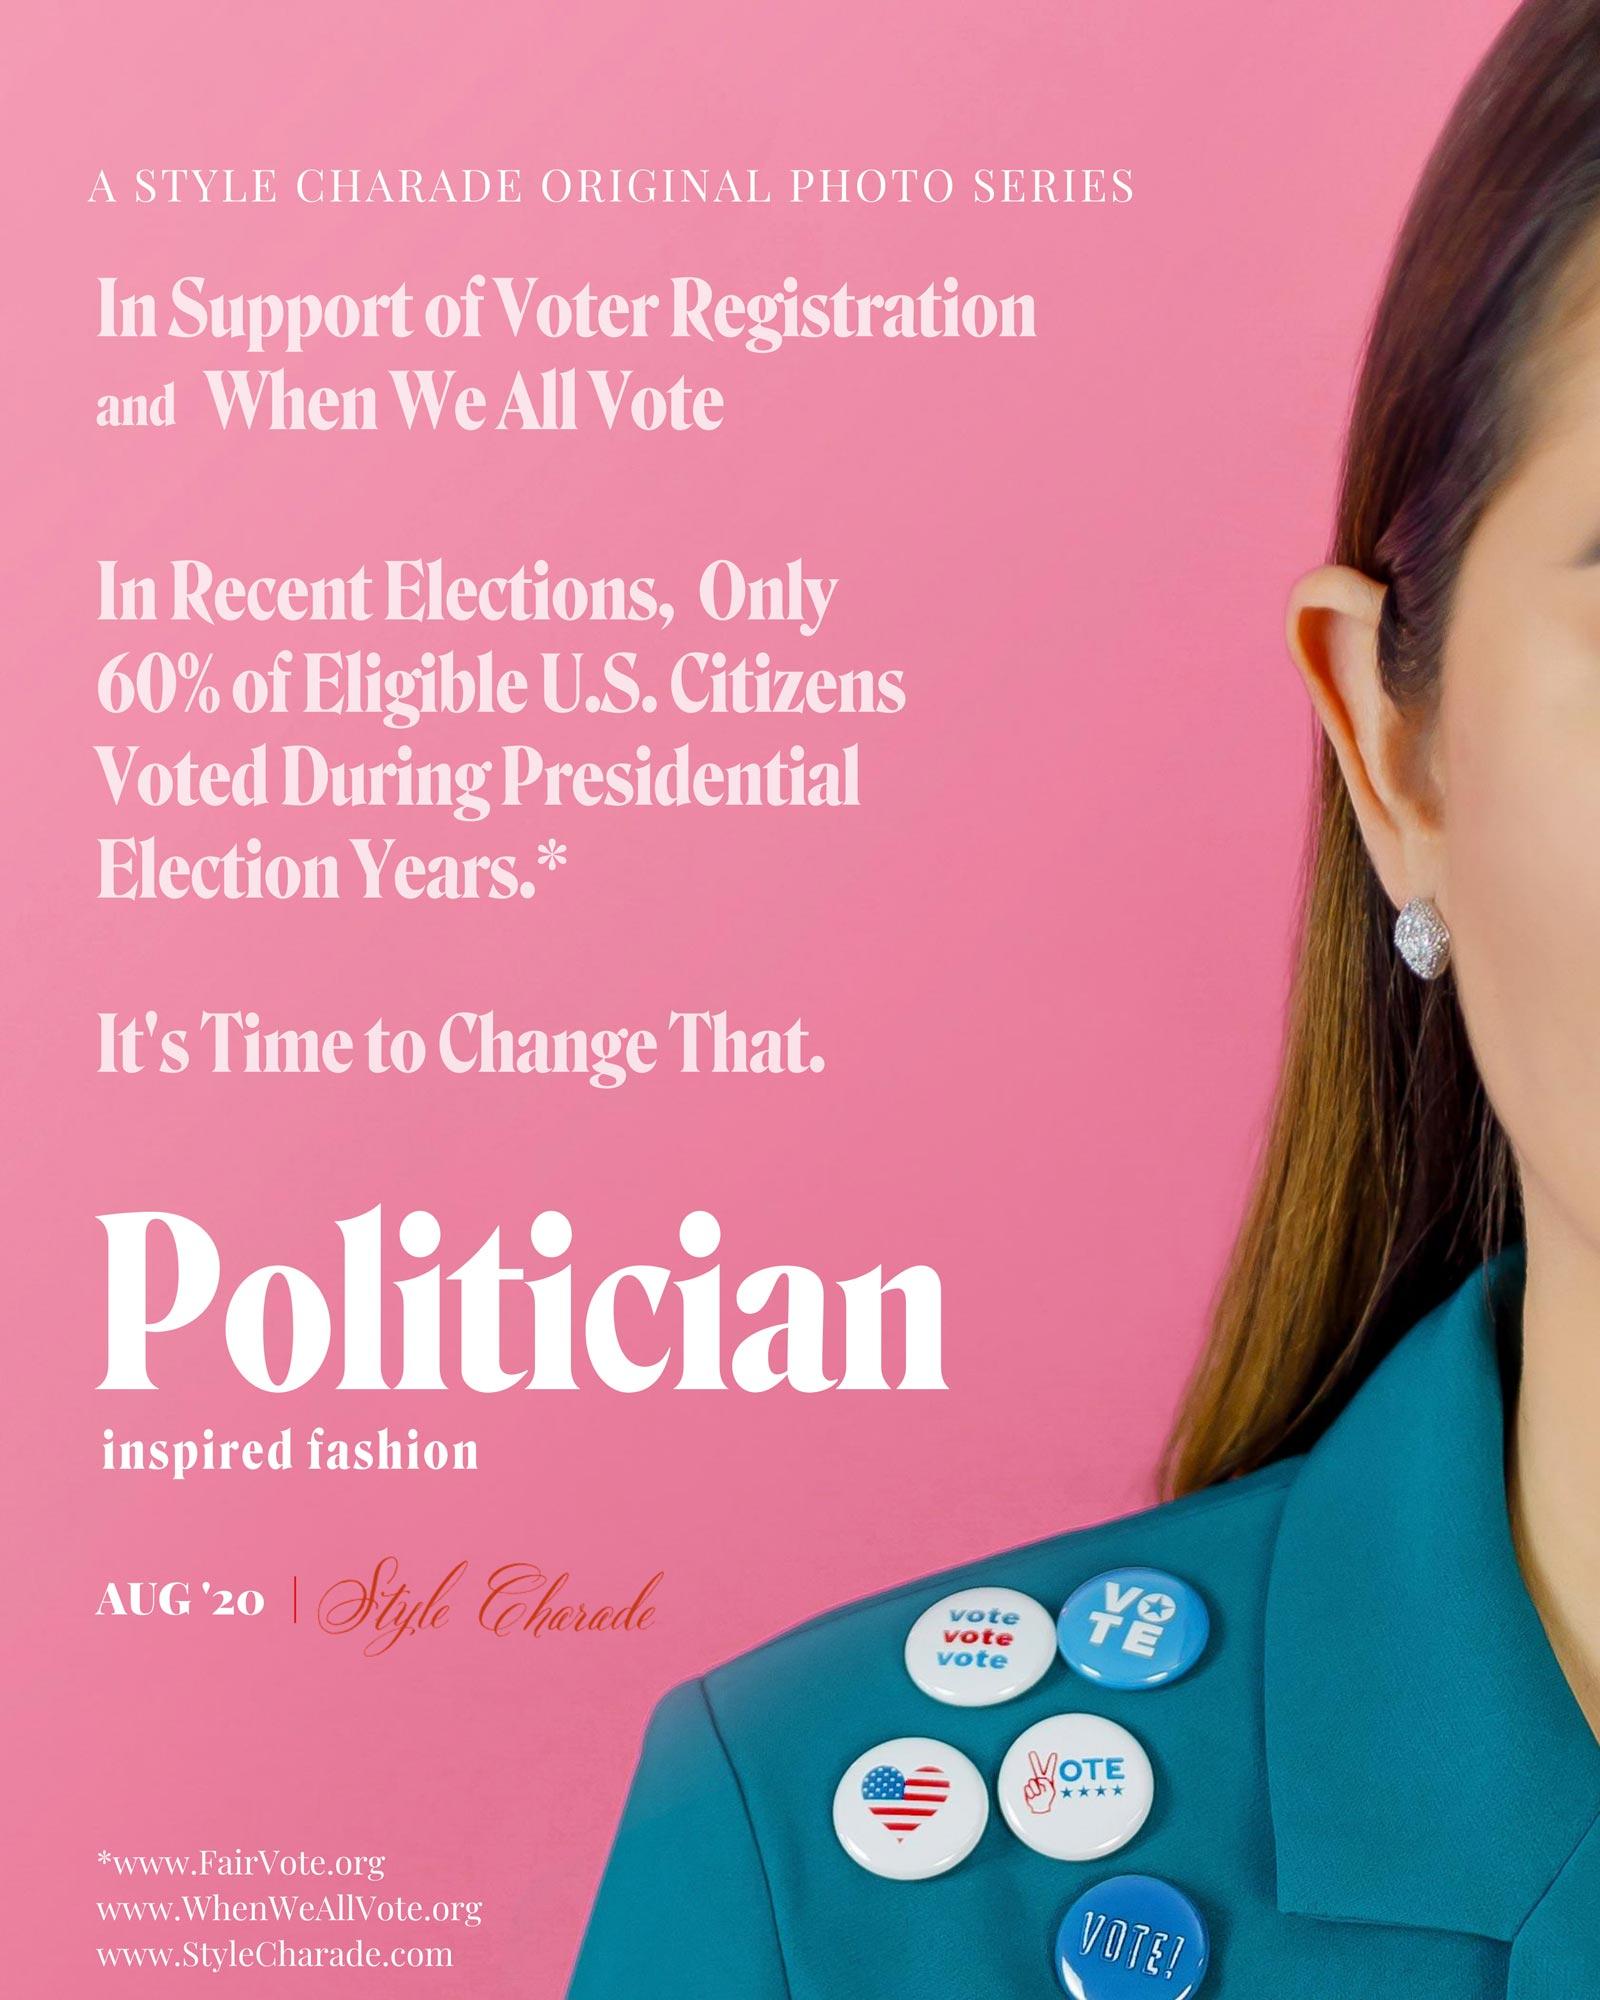 Politician Fashion Inspiration